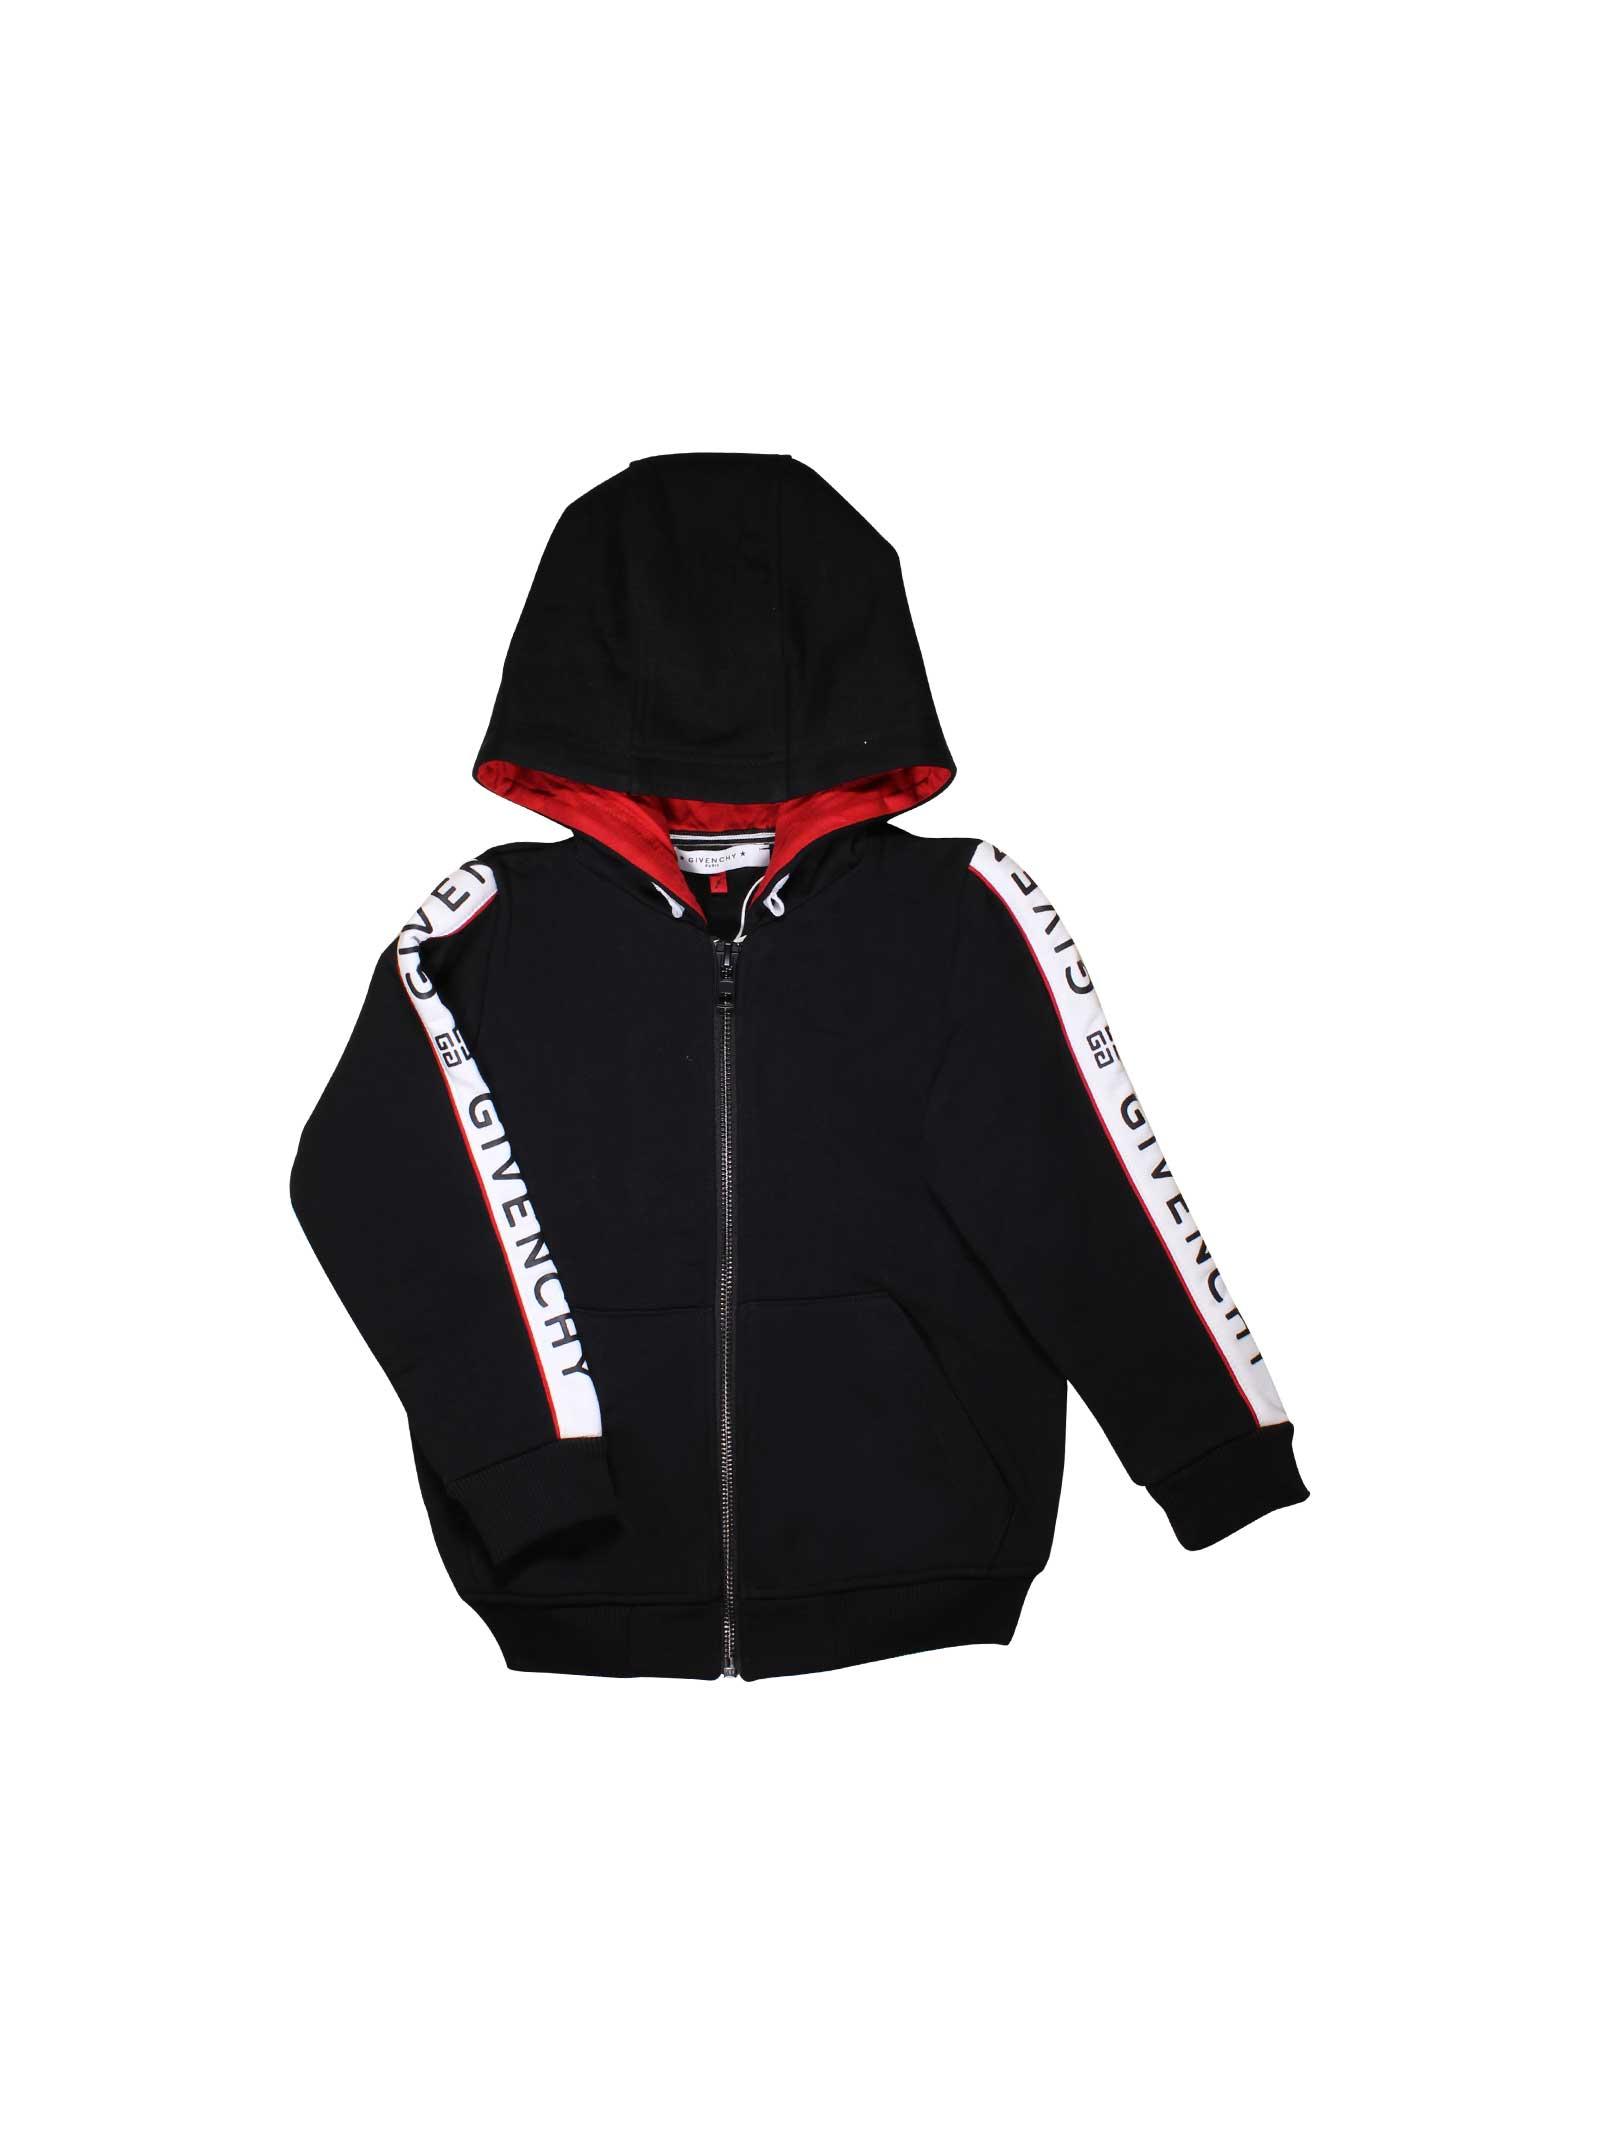 53c9387186c6 BLACK GIVENCHY KIDS SWEATSHIRT - Givenchy Kids - Mancini Junior